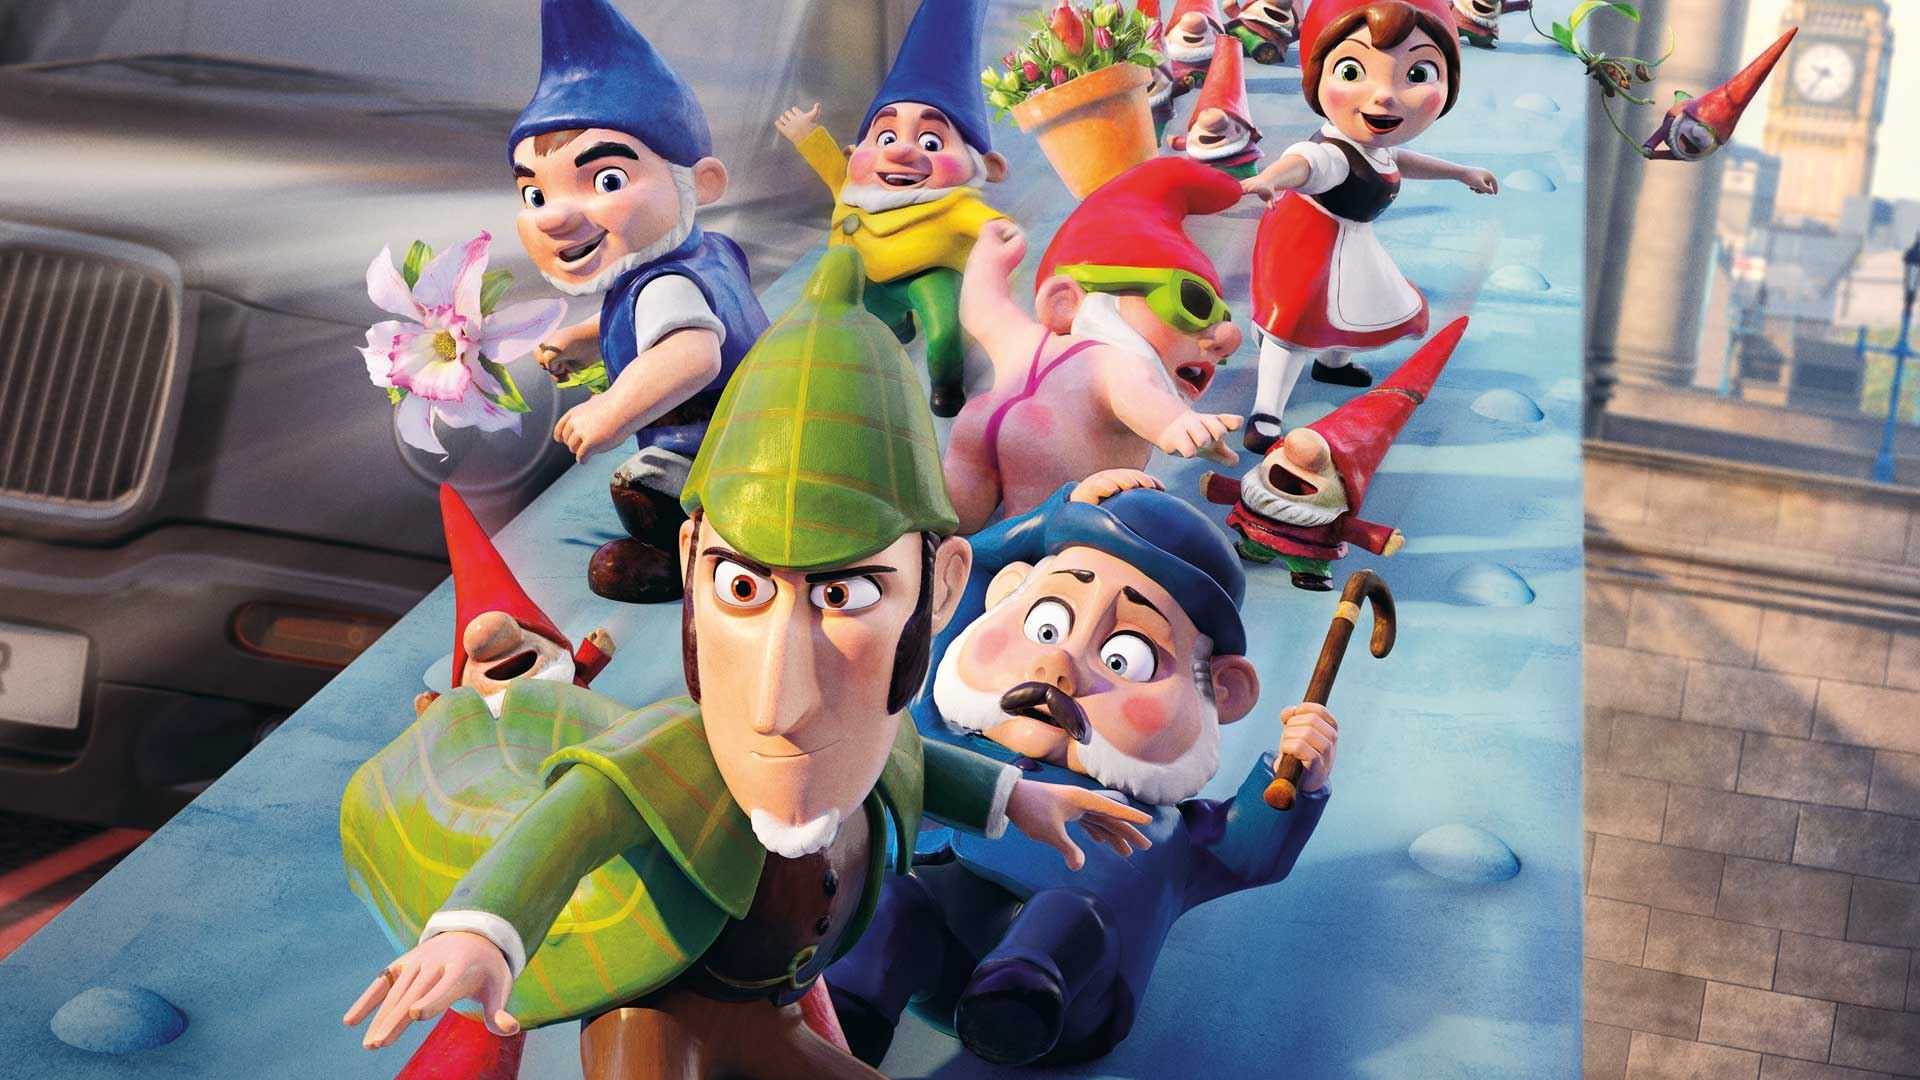 Bio, Bergsjö, Mästerdetektiven Sherlock Gnomes,  © Bio, Bergsjö, Mästerdetektiven Sherlock Gnomes, Bio, Bergsjö, Mästerdetektiven Sherlock Gnomes